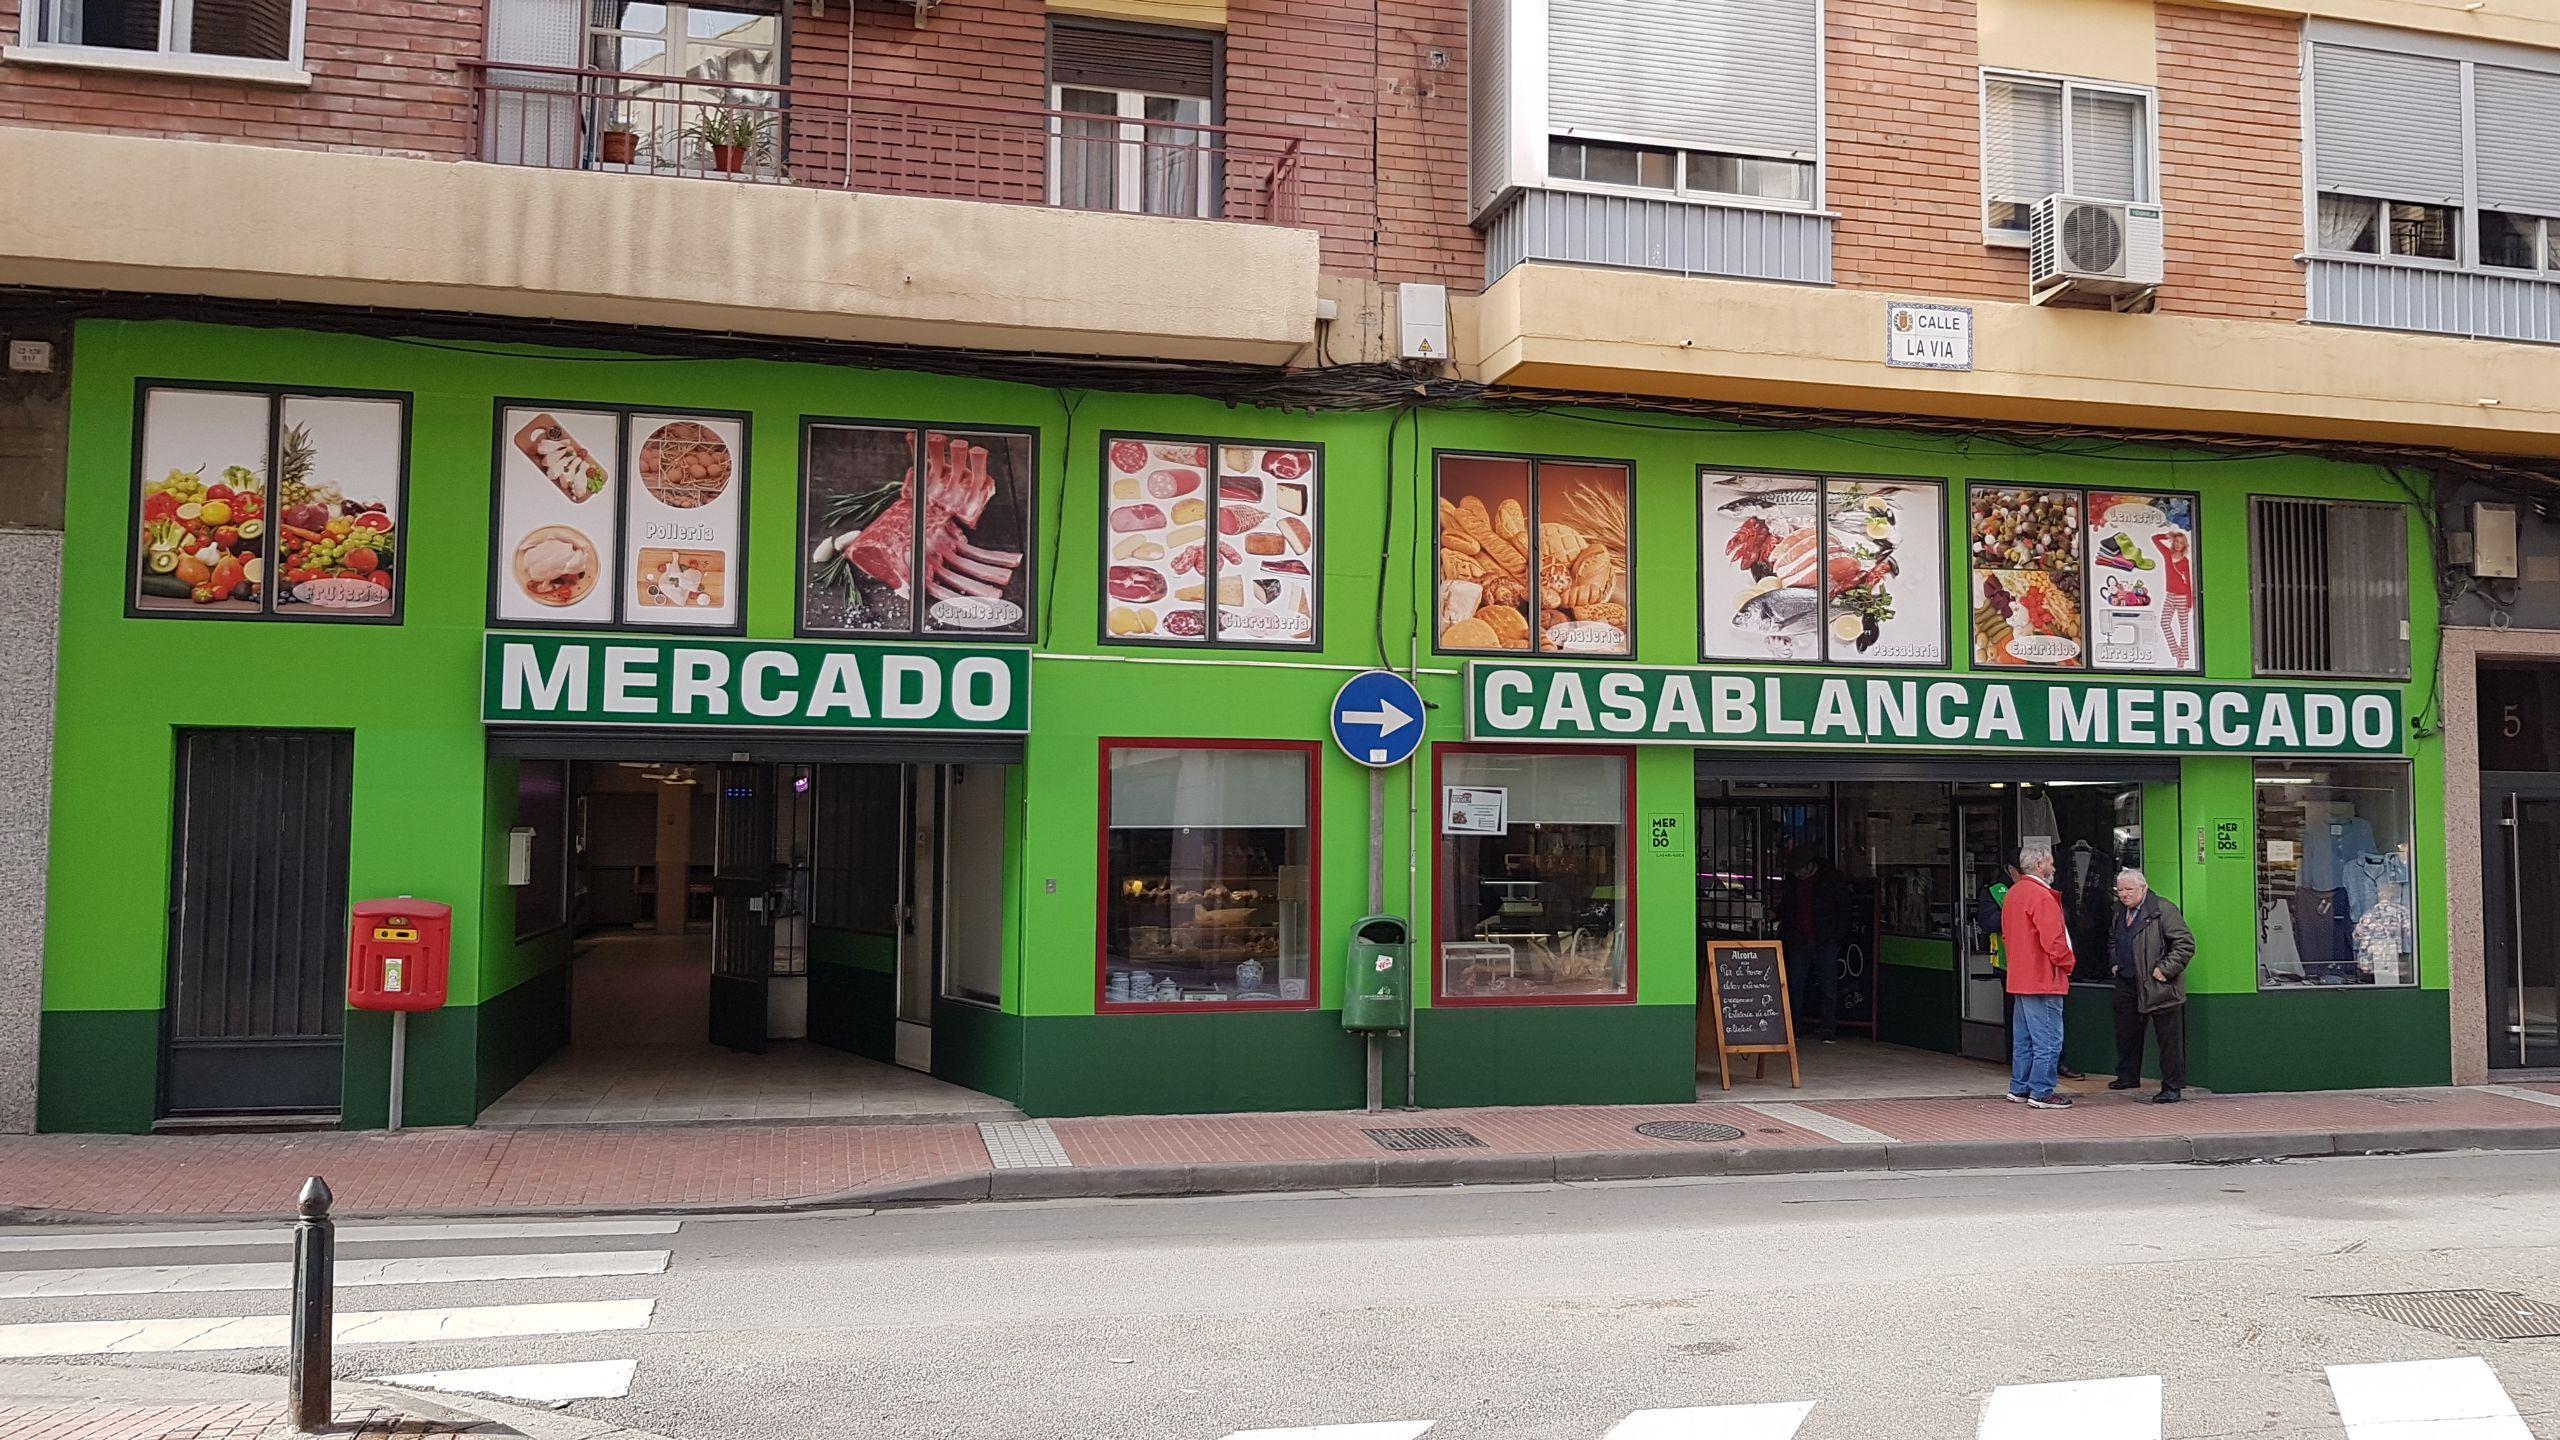 Mercado CASABLANCA